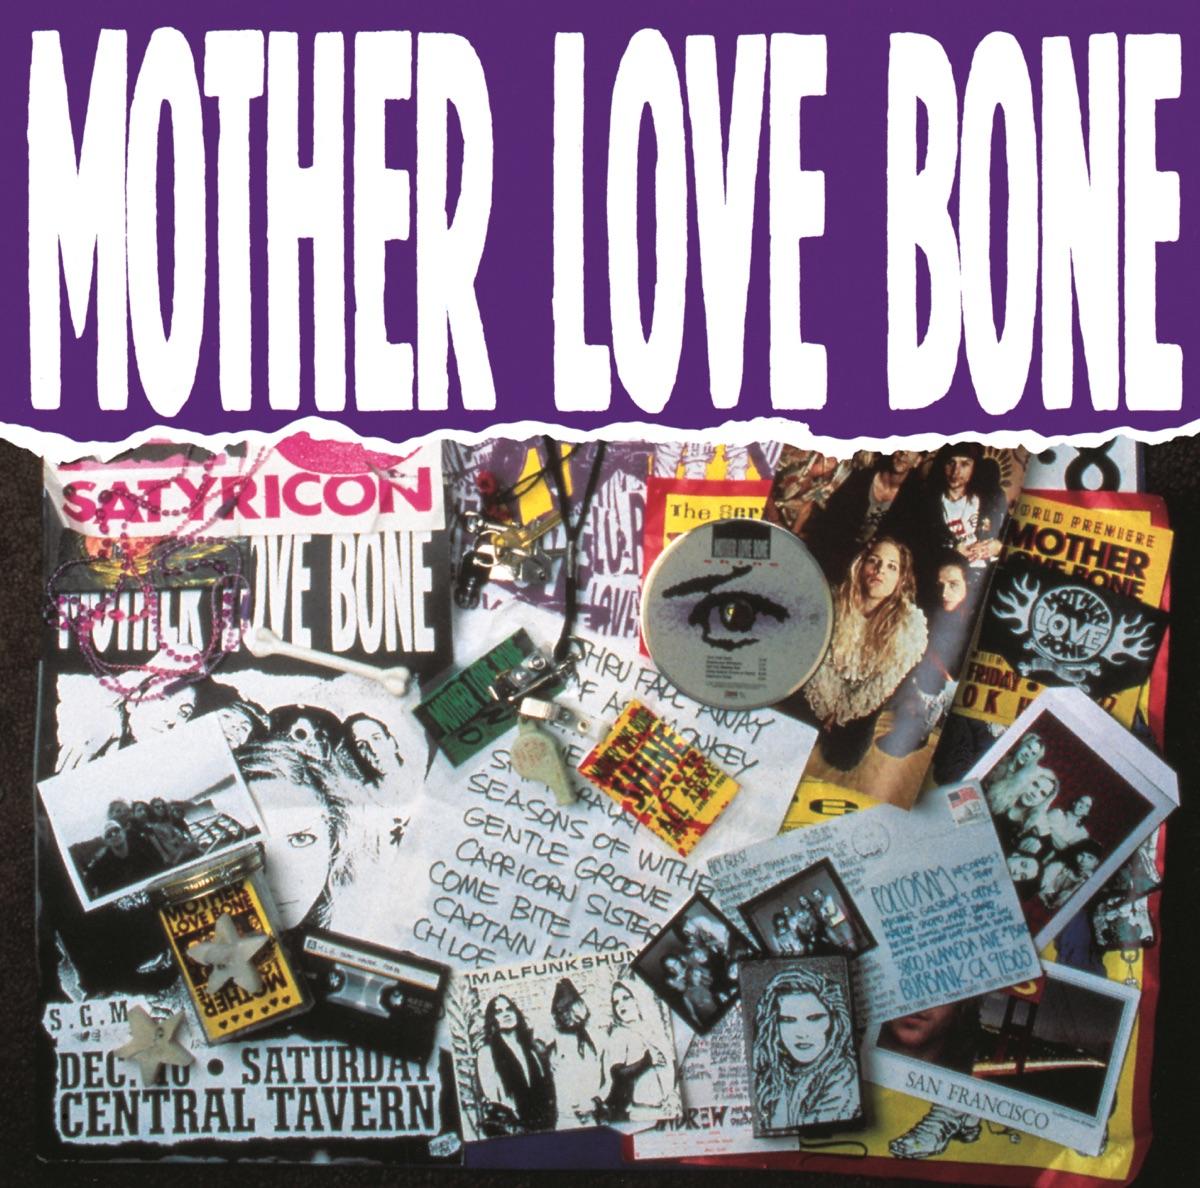 Mother Love Bone Mother Love Bone CD cover